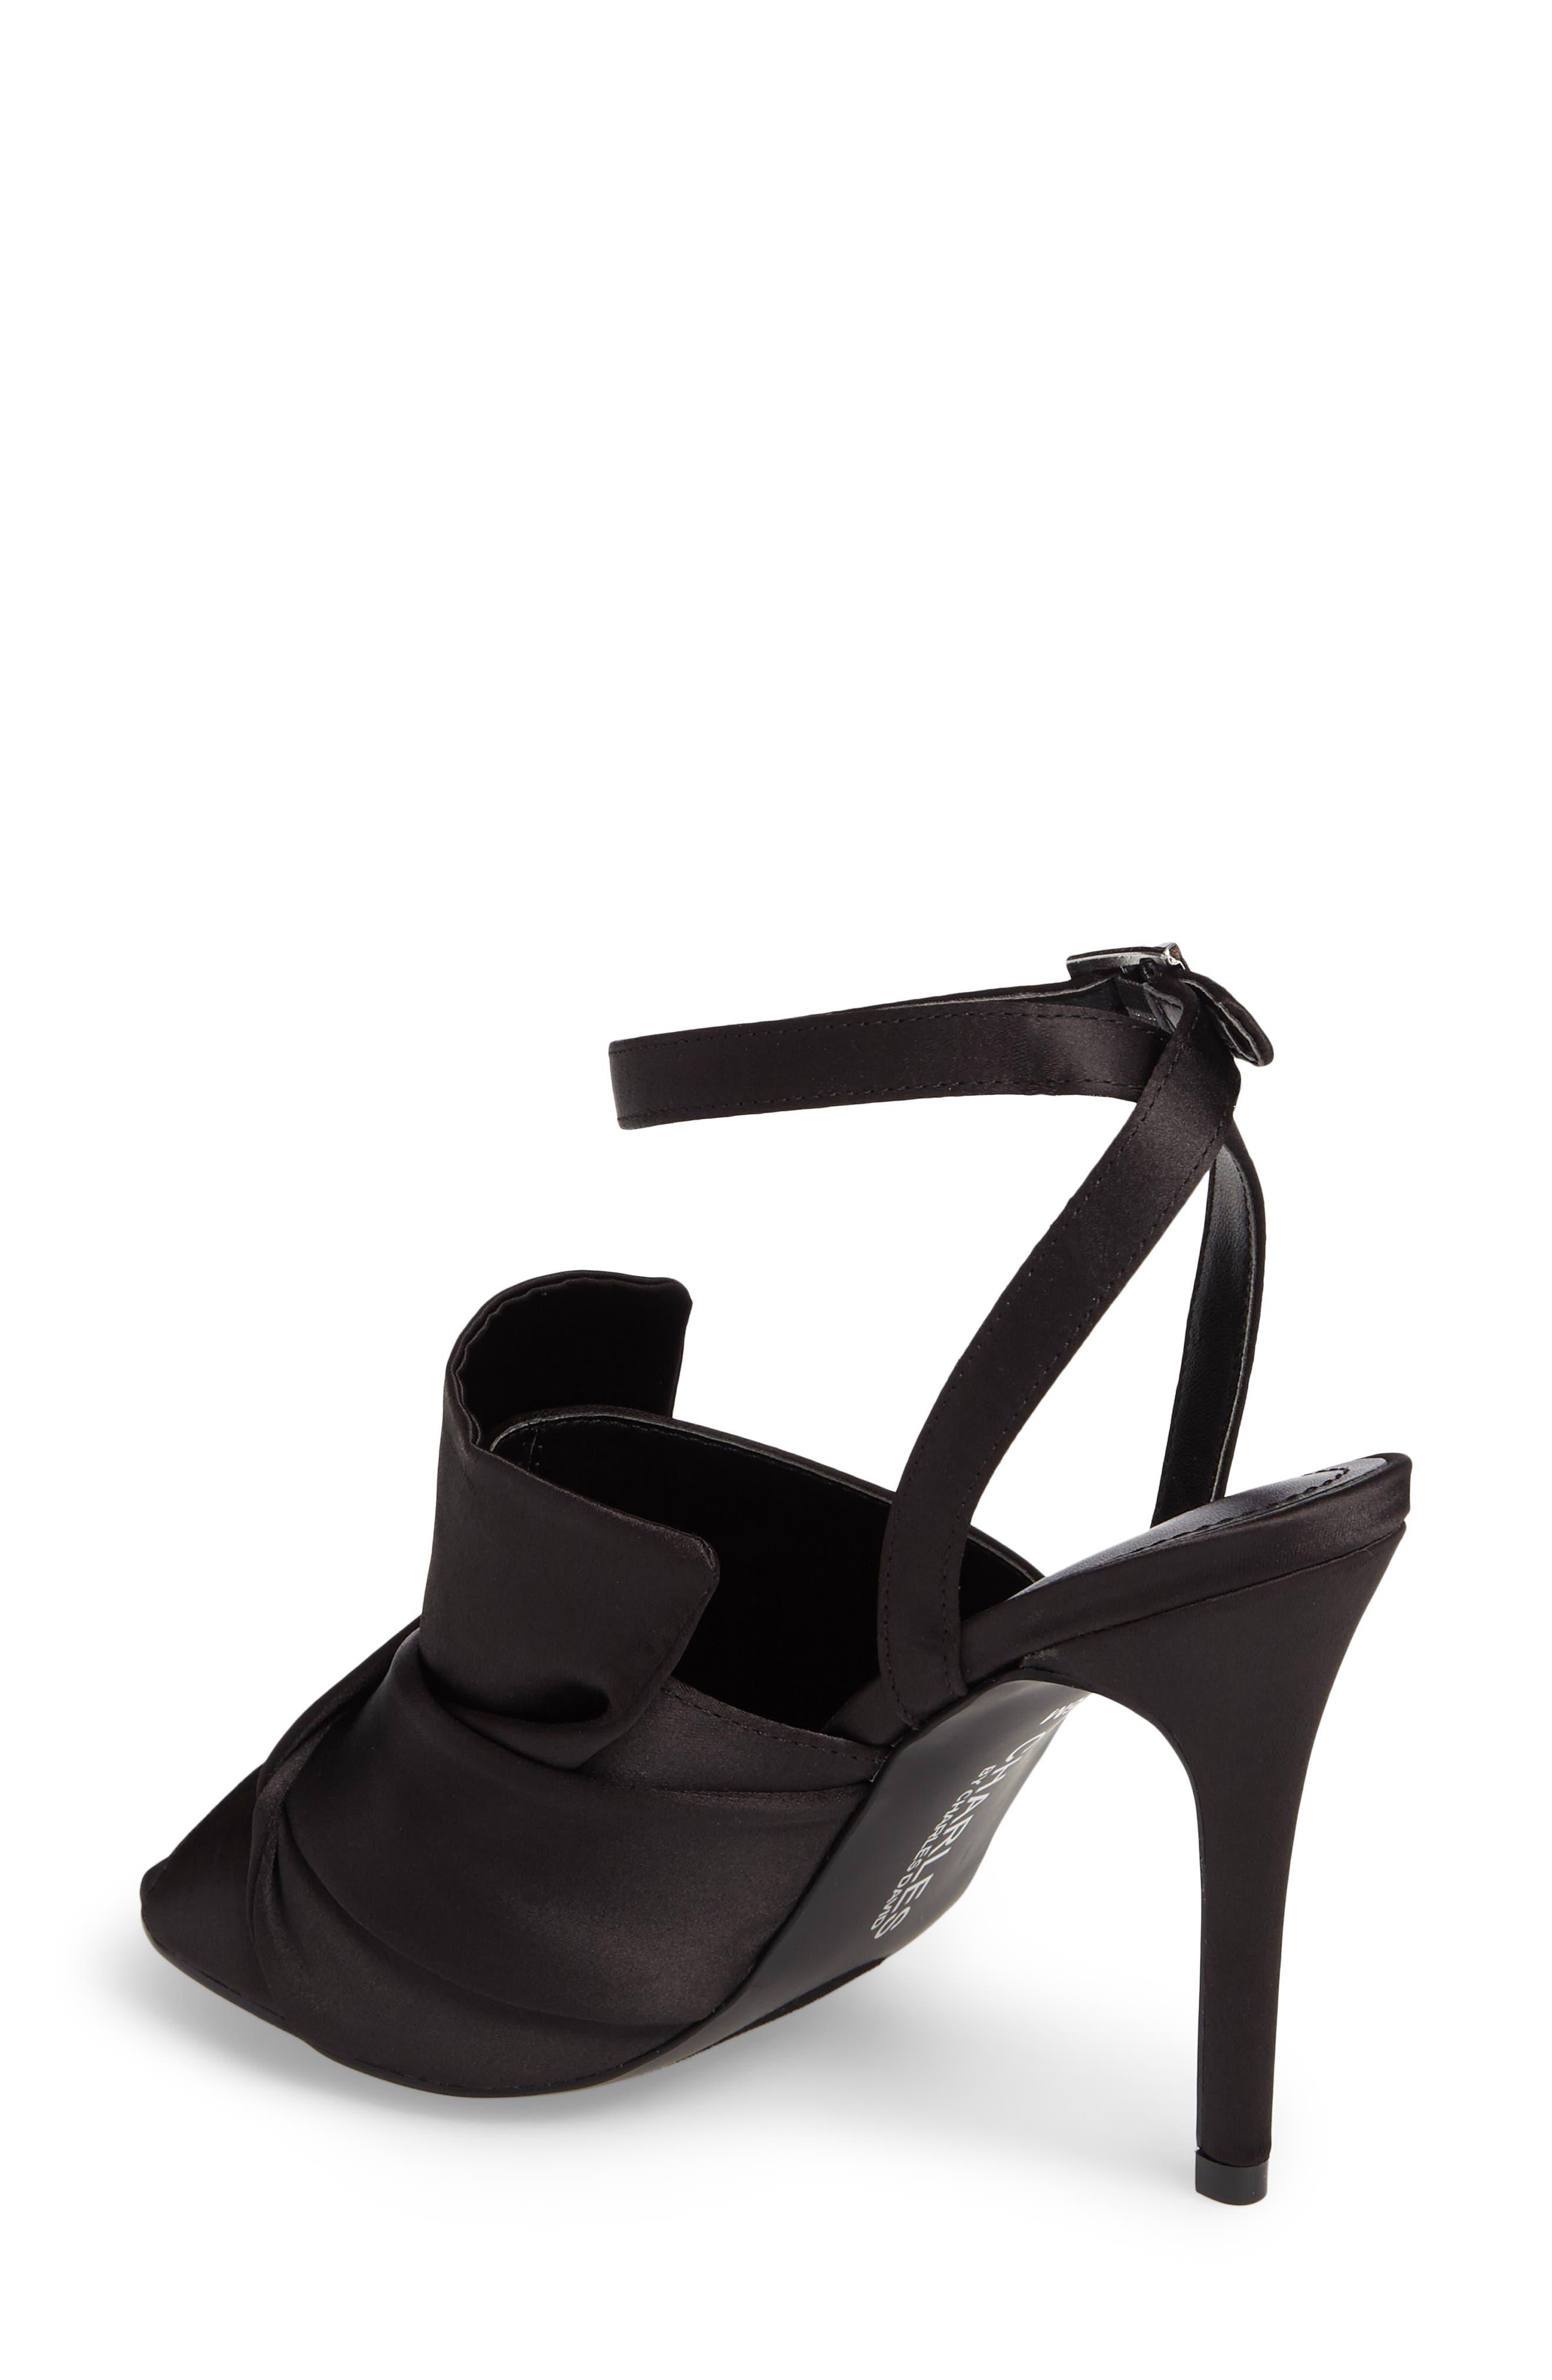 Rachel Ankle Strap Sandal,                             Alternate thumbnail 4, color,